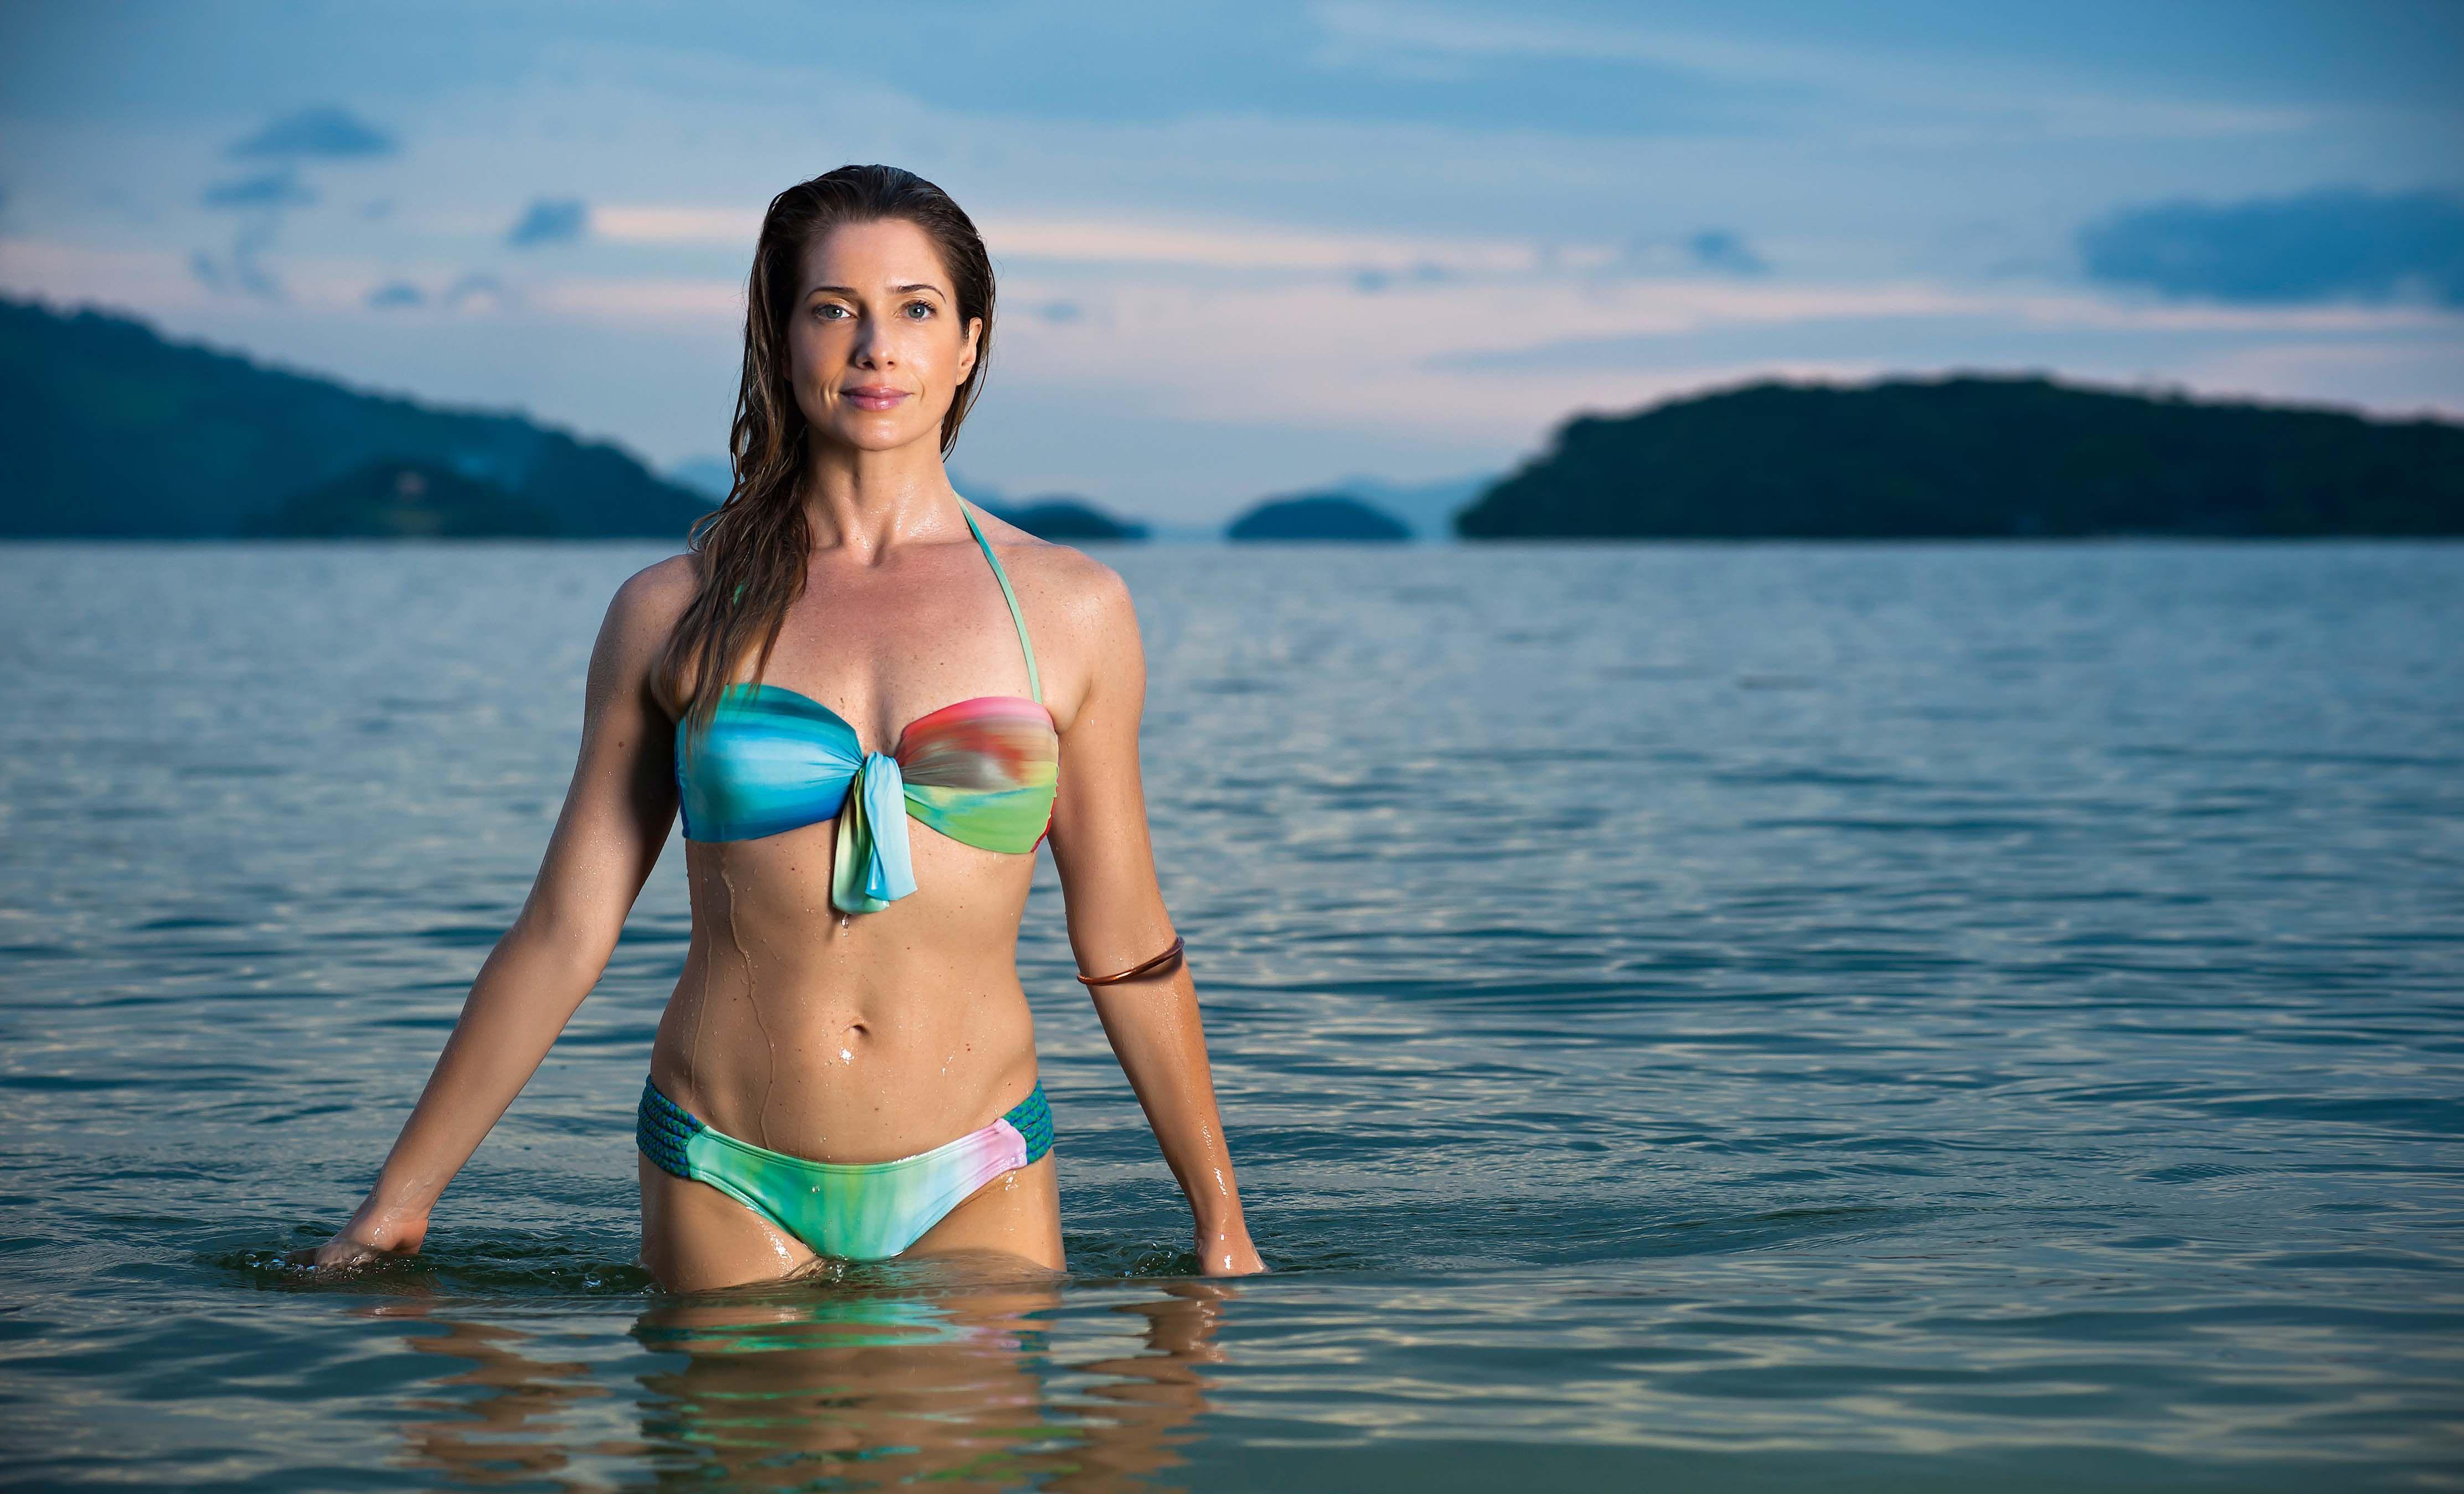 Boobs Bikini Mariana de Souza Alves Lima naked photo 2017